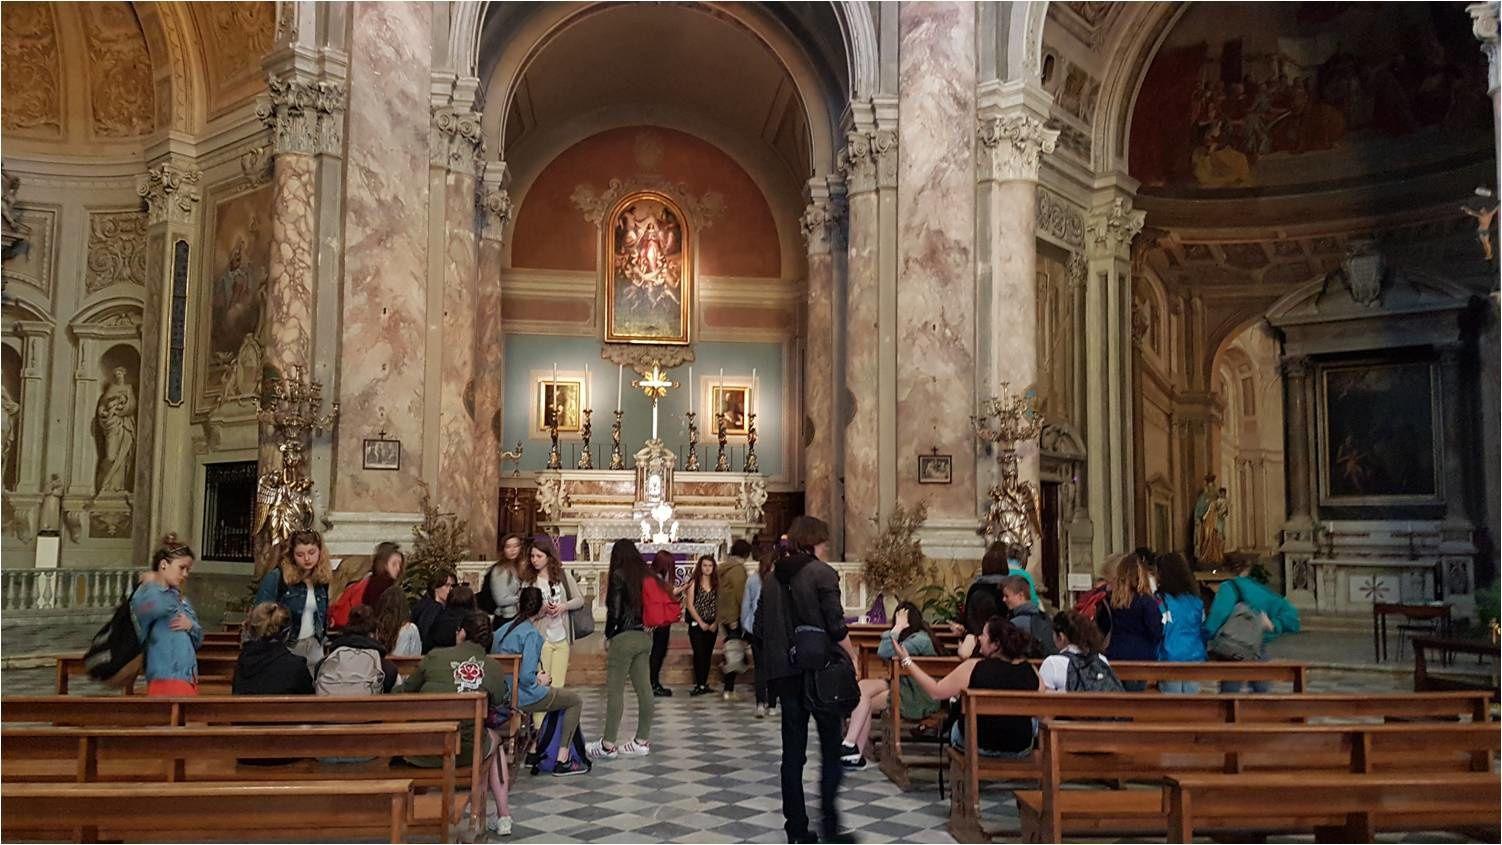 Livourne, église Sainte Catherine, 03/04/17 16:20